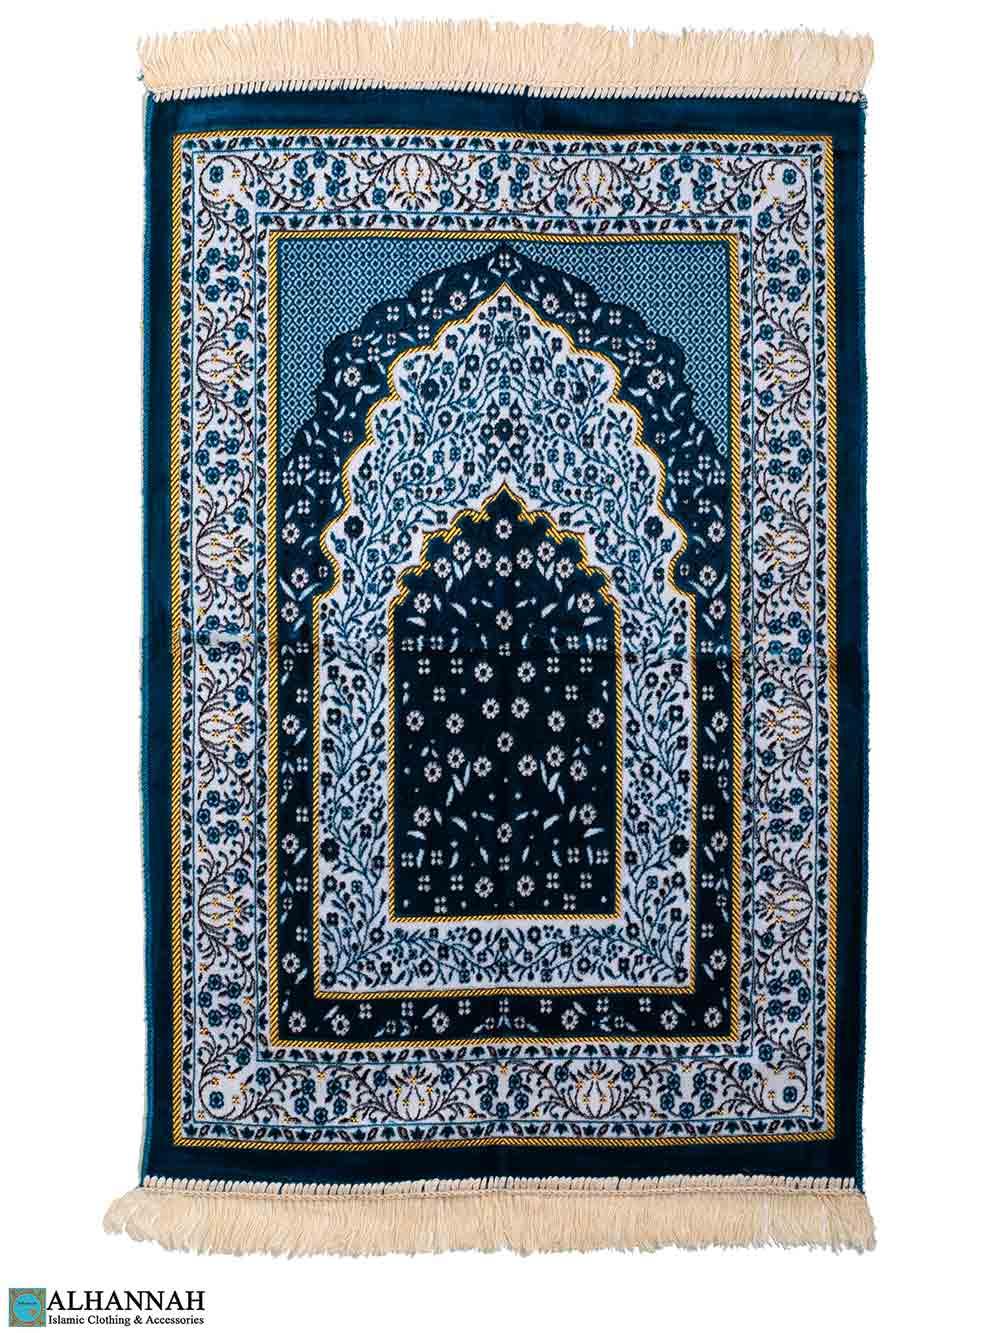 Turkish Prayer Rug in Turquoise